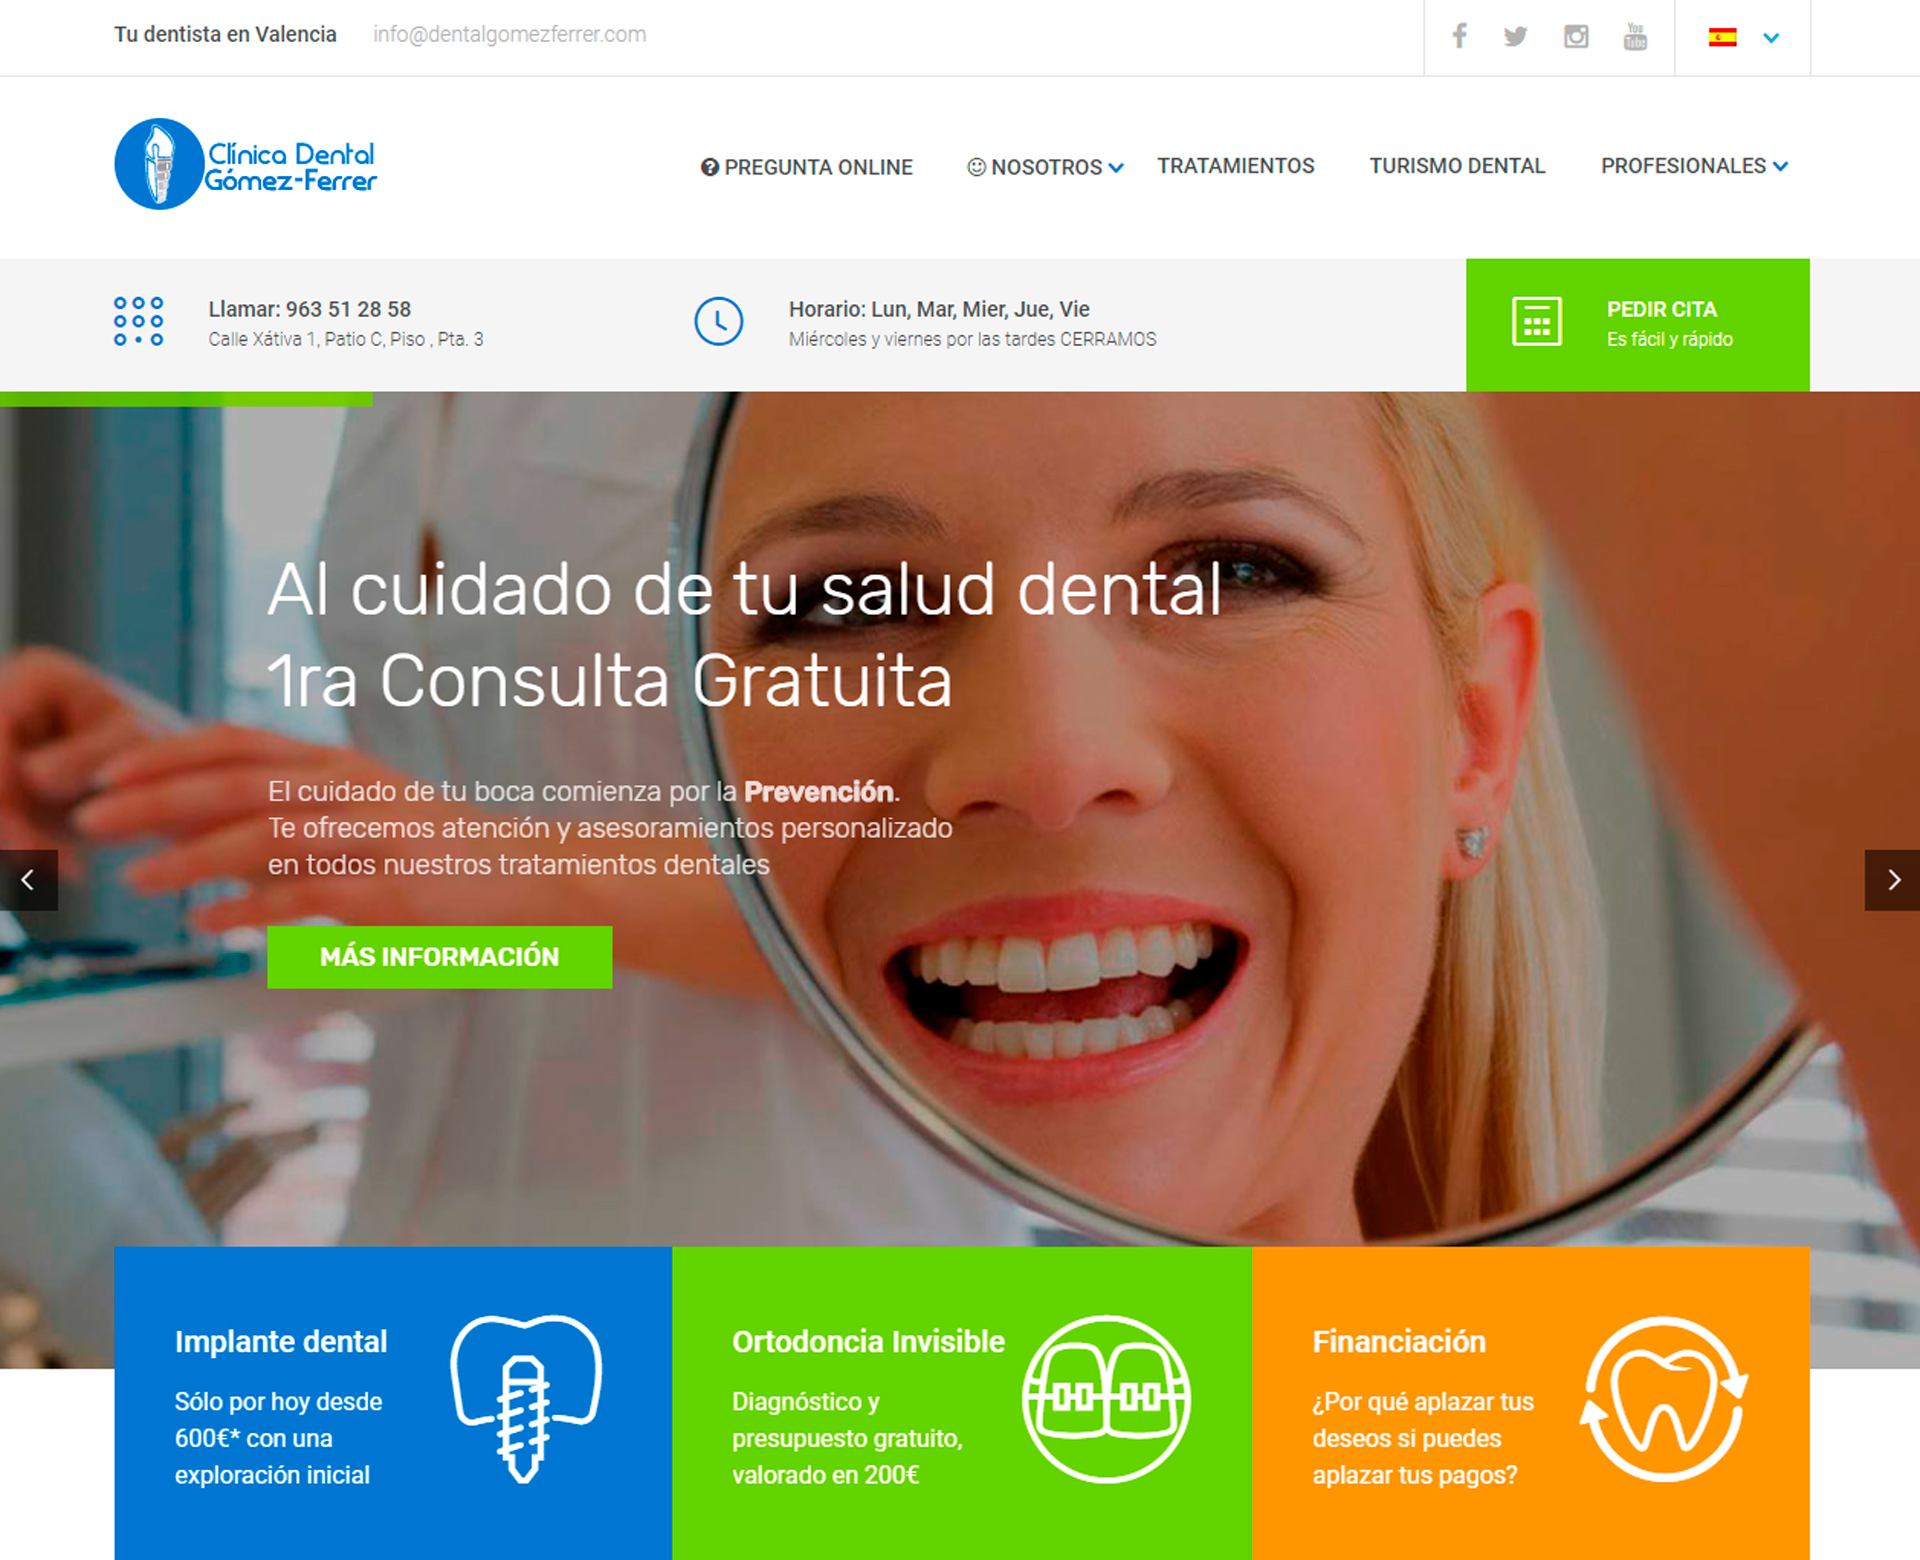 Clínica Dental Gómez-Ferrer en Valencia